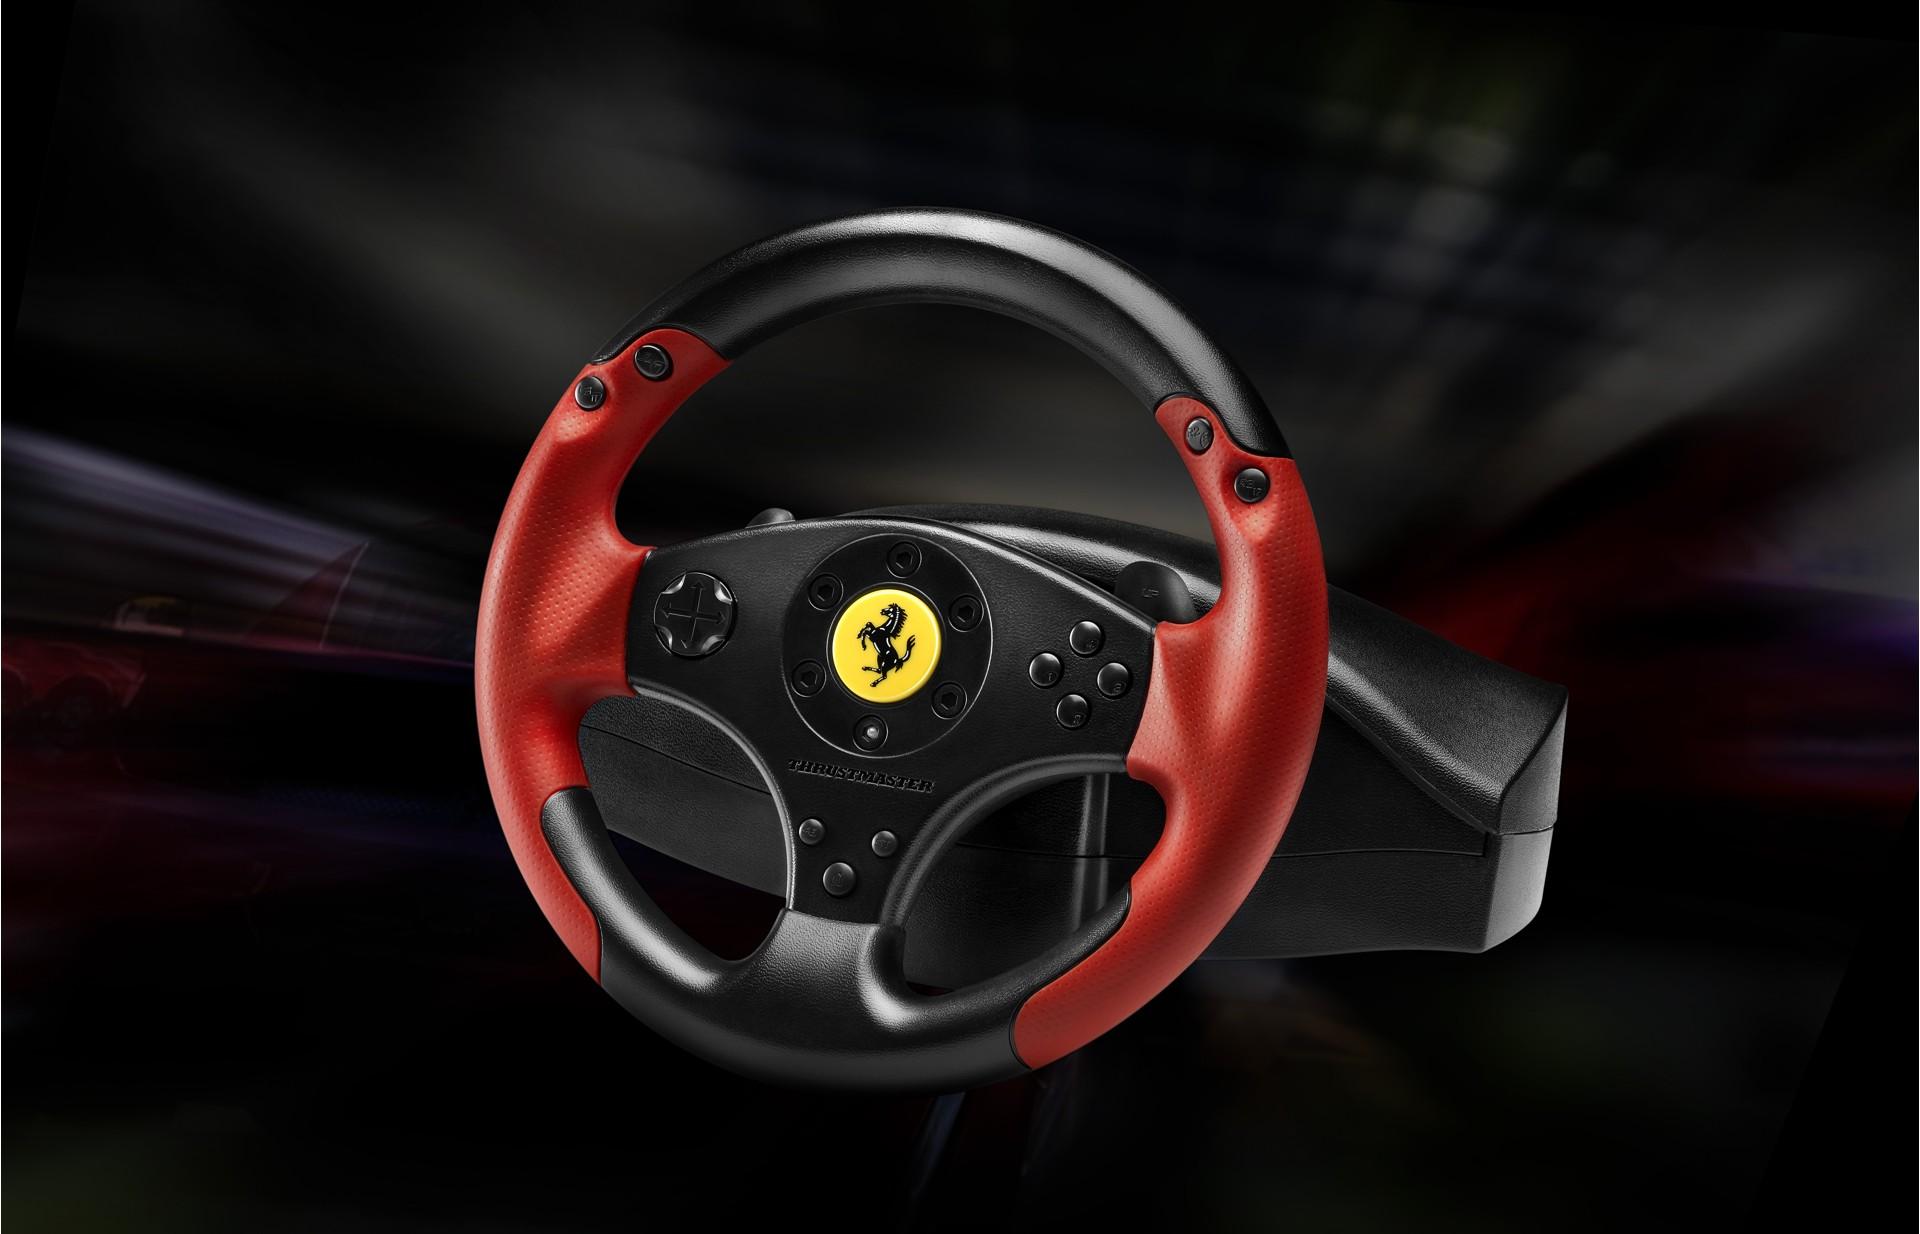 Kaufe Thrustmaster Ferrari Racing Wheel Red Legend Edition